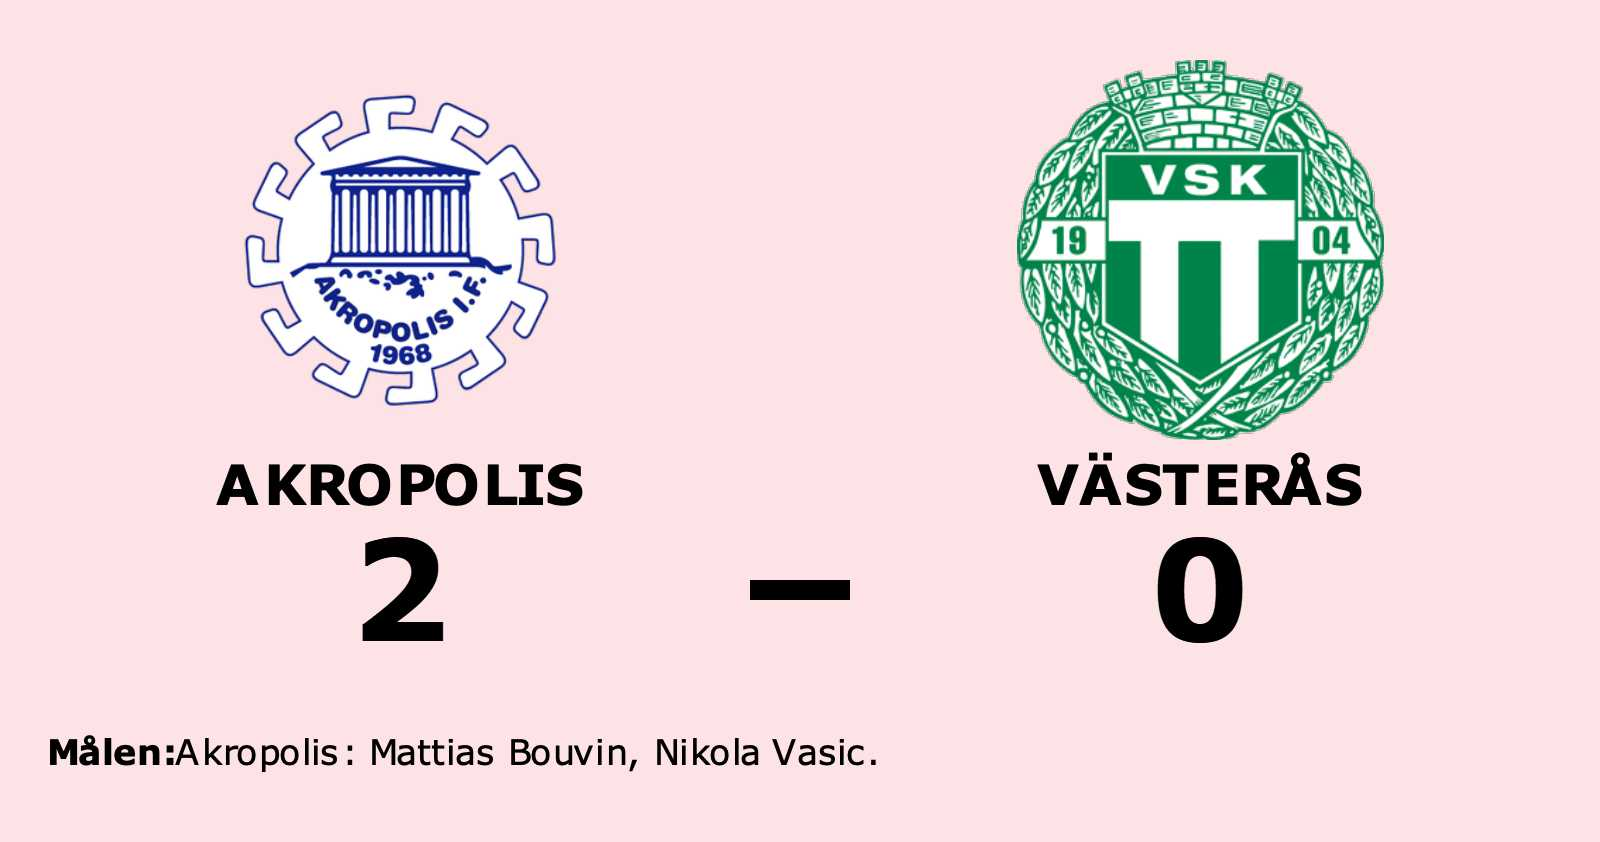 Bouvin och Vasic målgörare i Akropolis seger